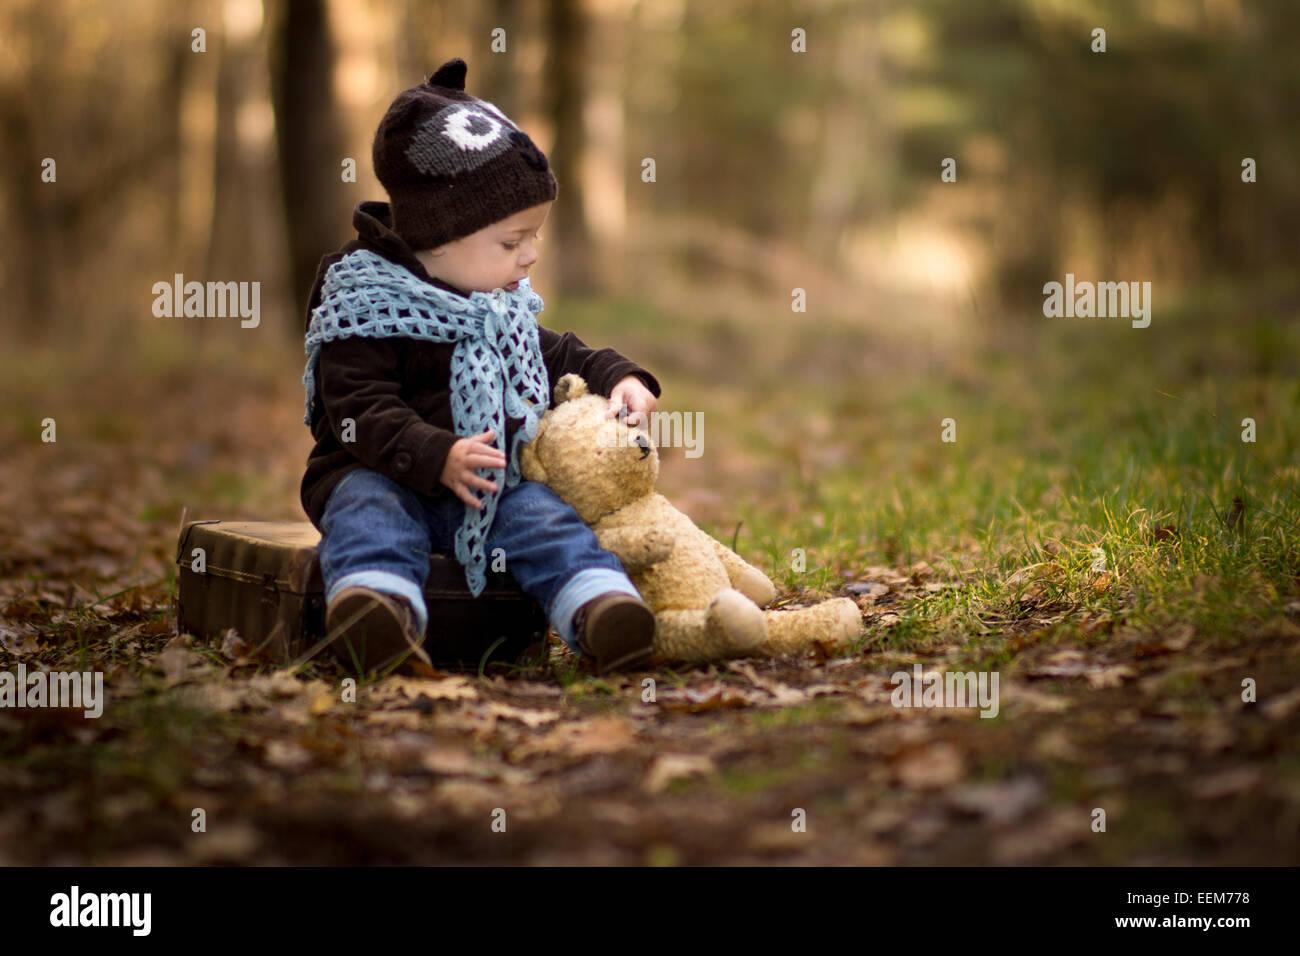 Portrait of baby boy sitting en forêt avec son ours en peluche Photo Stock